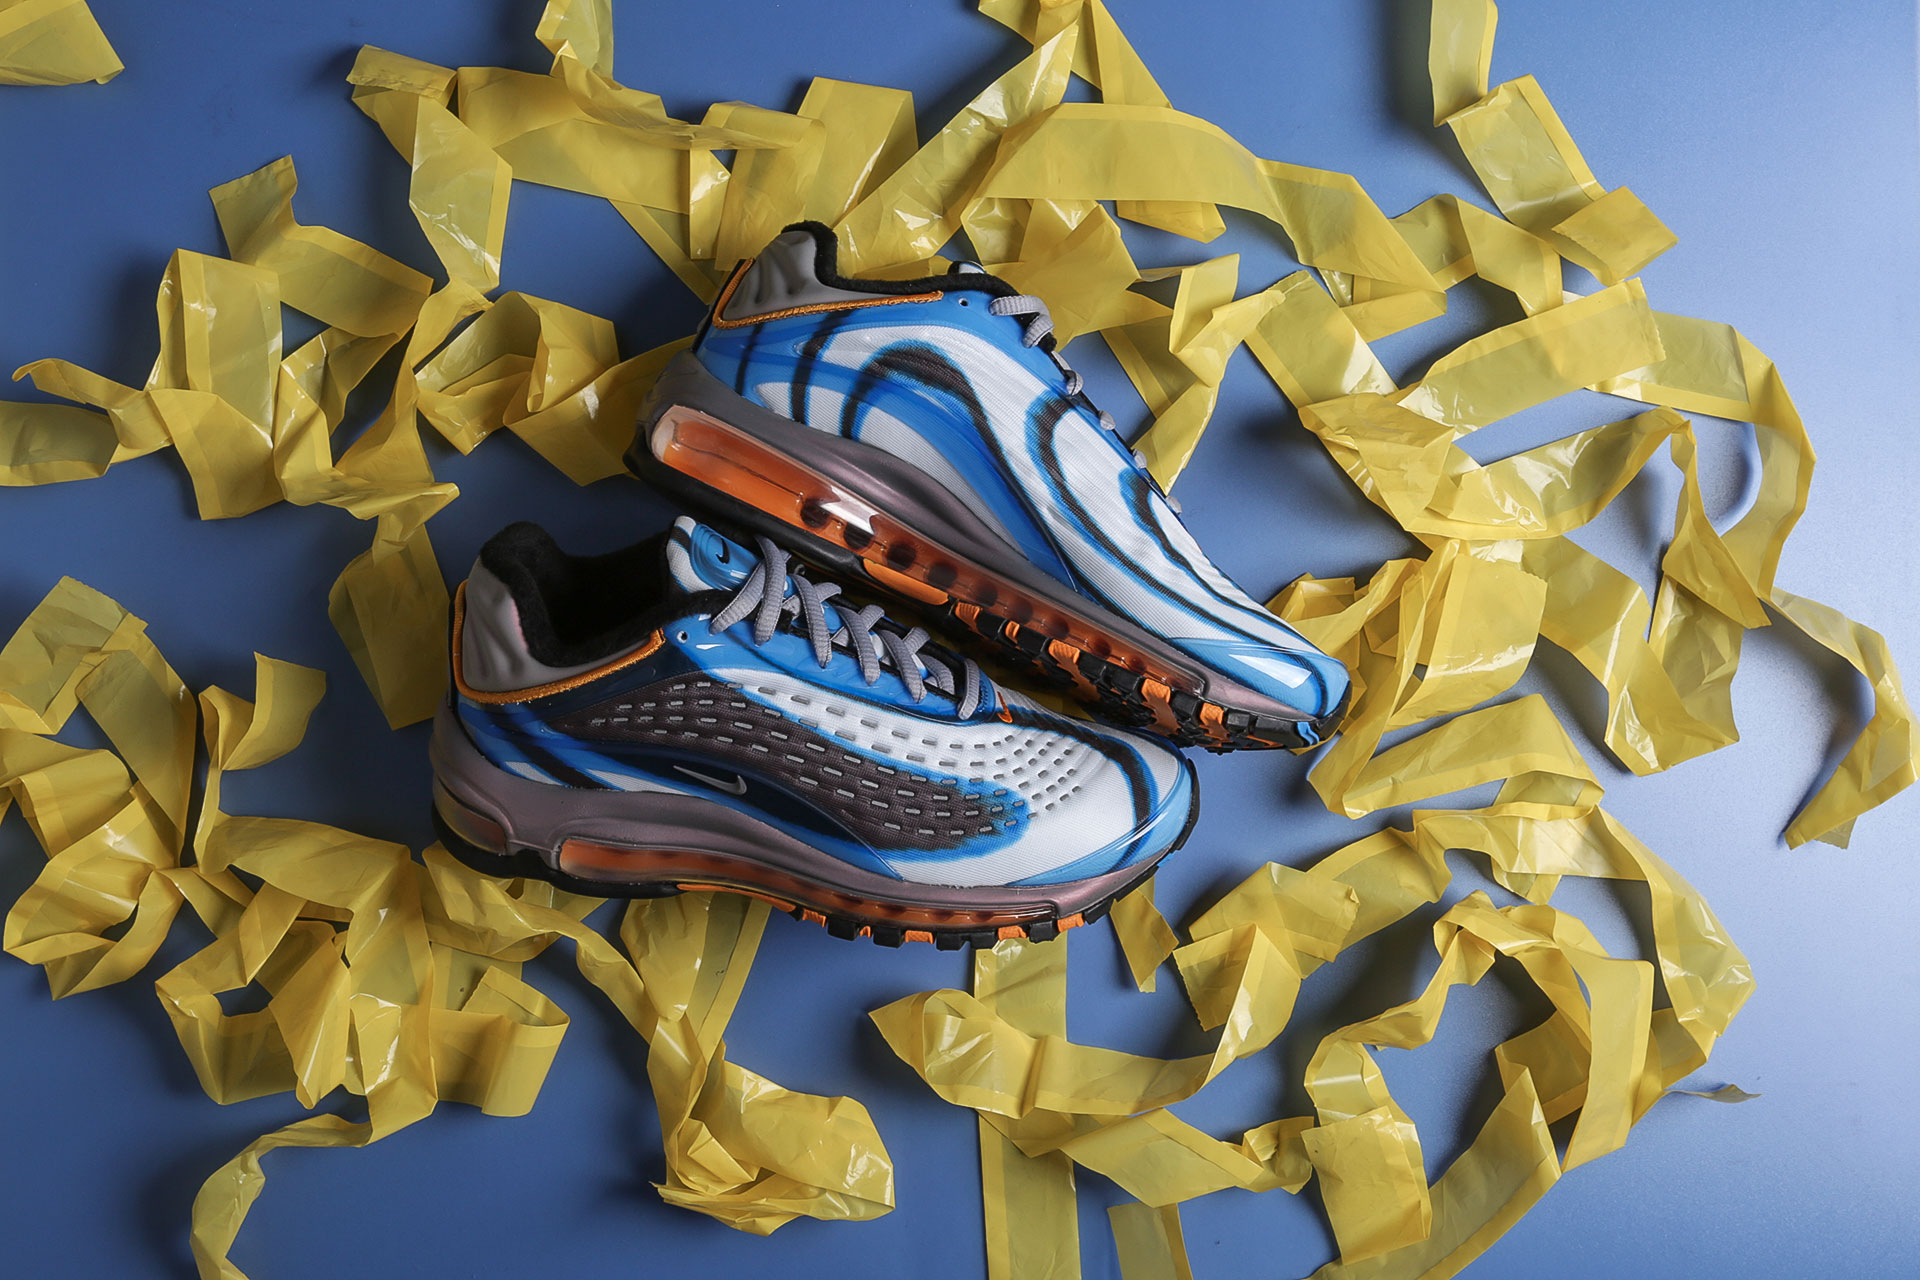 961ff6a1 Купить мультиколые женские кроссовки WMNS Air Max Deluxe от Nike ...